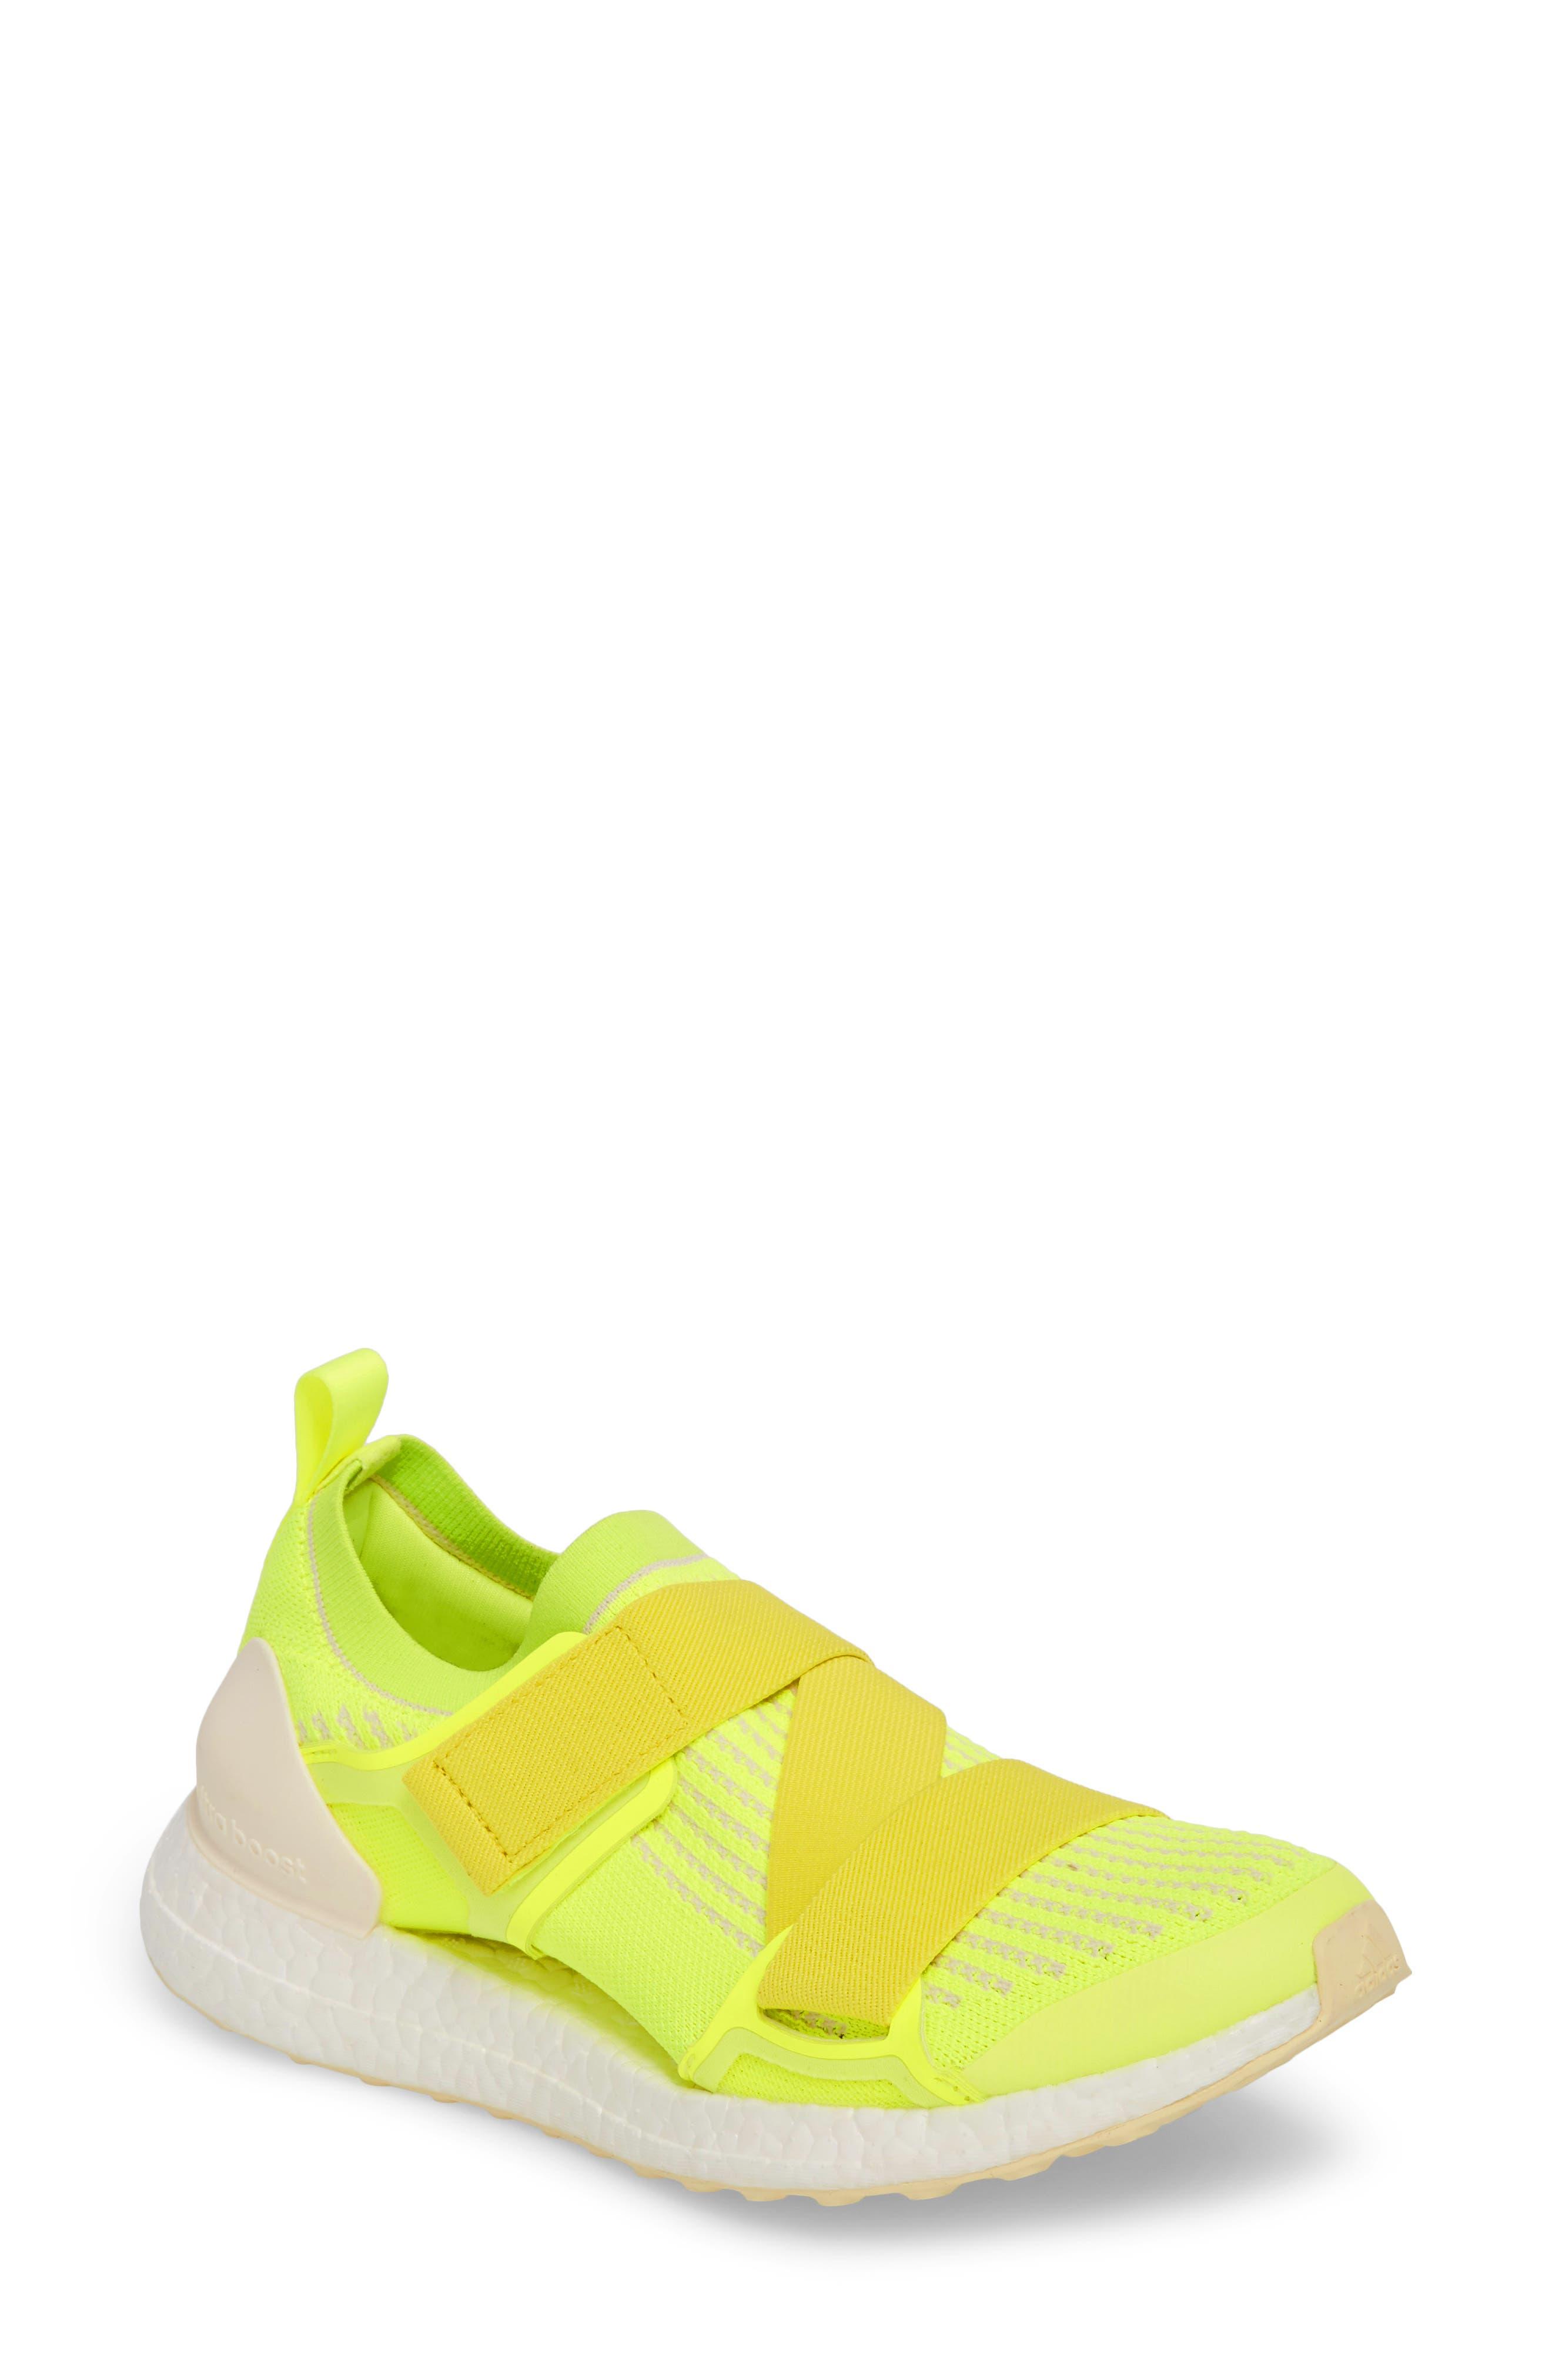 UltraBoost X Running Shoe,                             Main thumbnail 1, color,                             SOLAR YELLOW/ YELLOW/ SUN